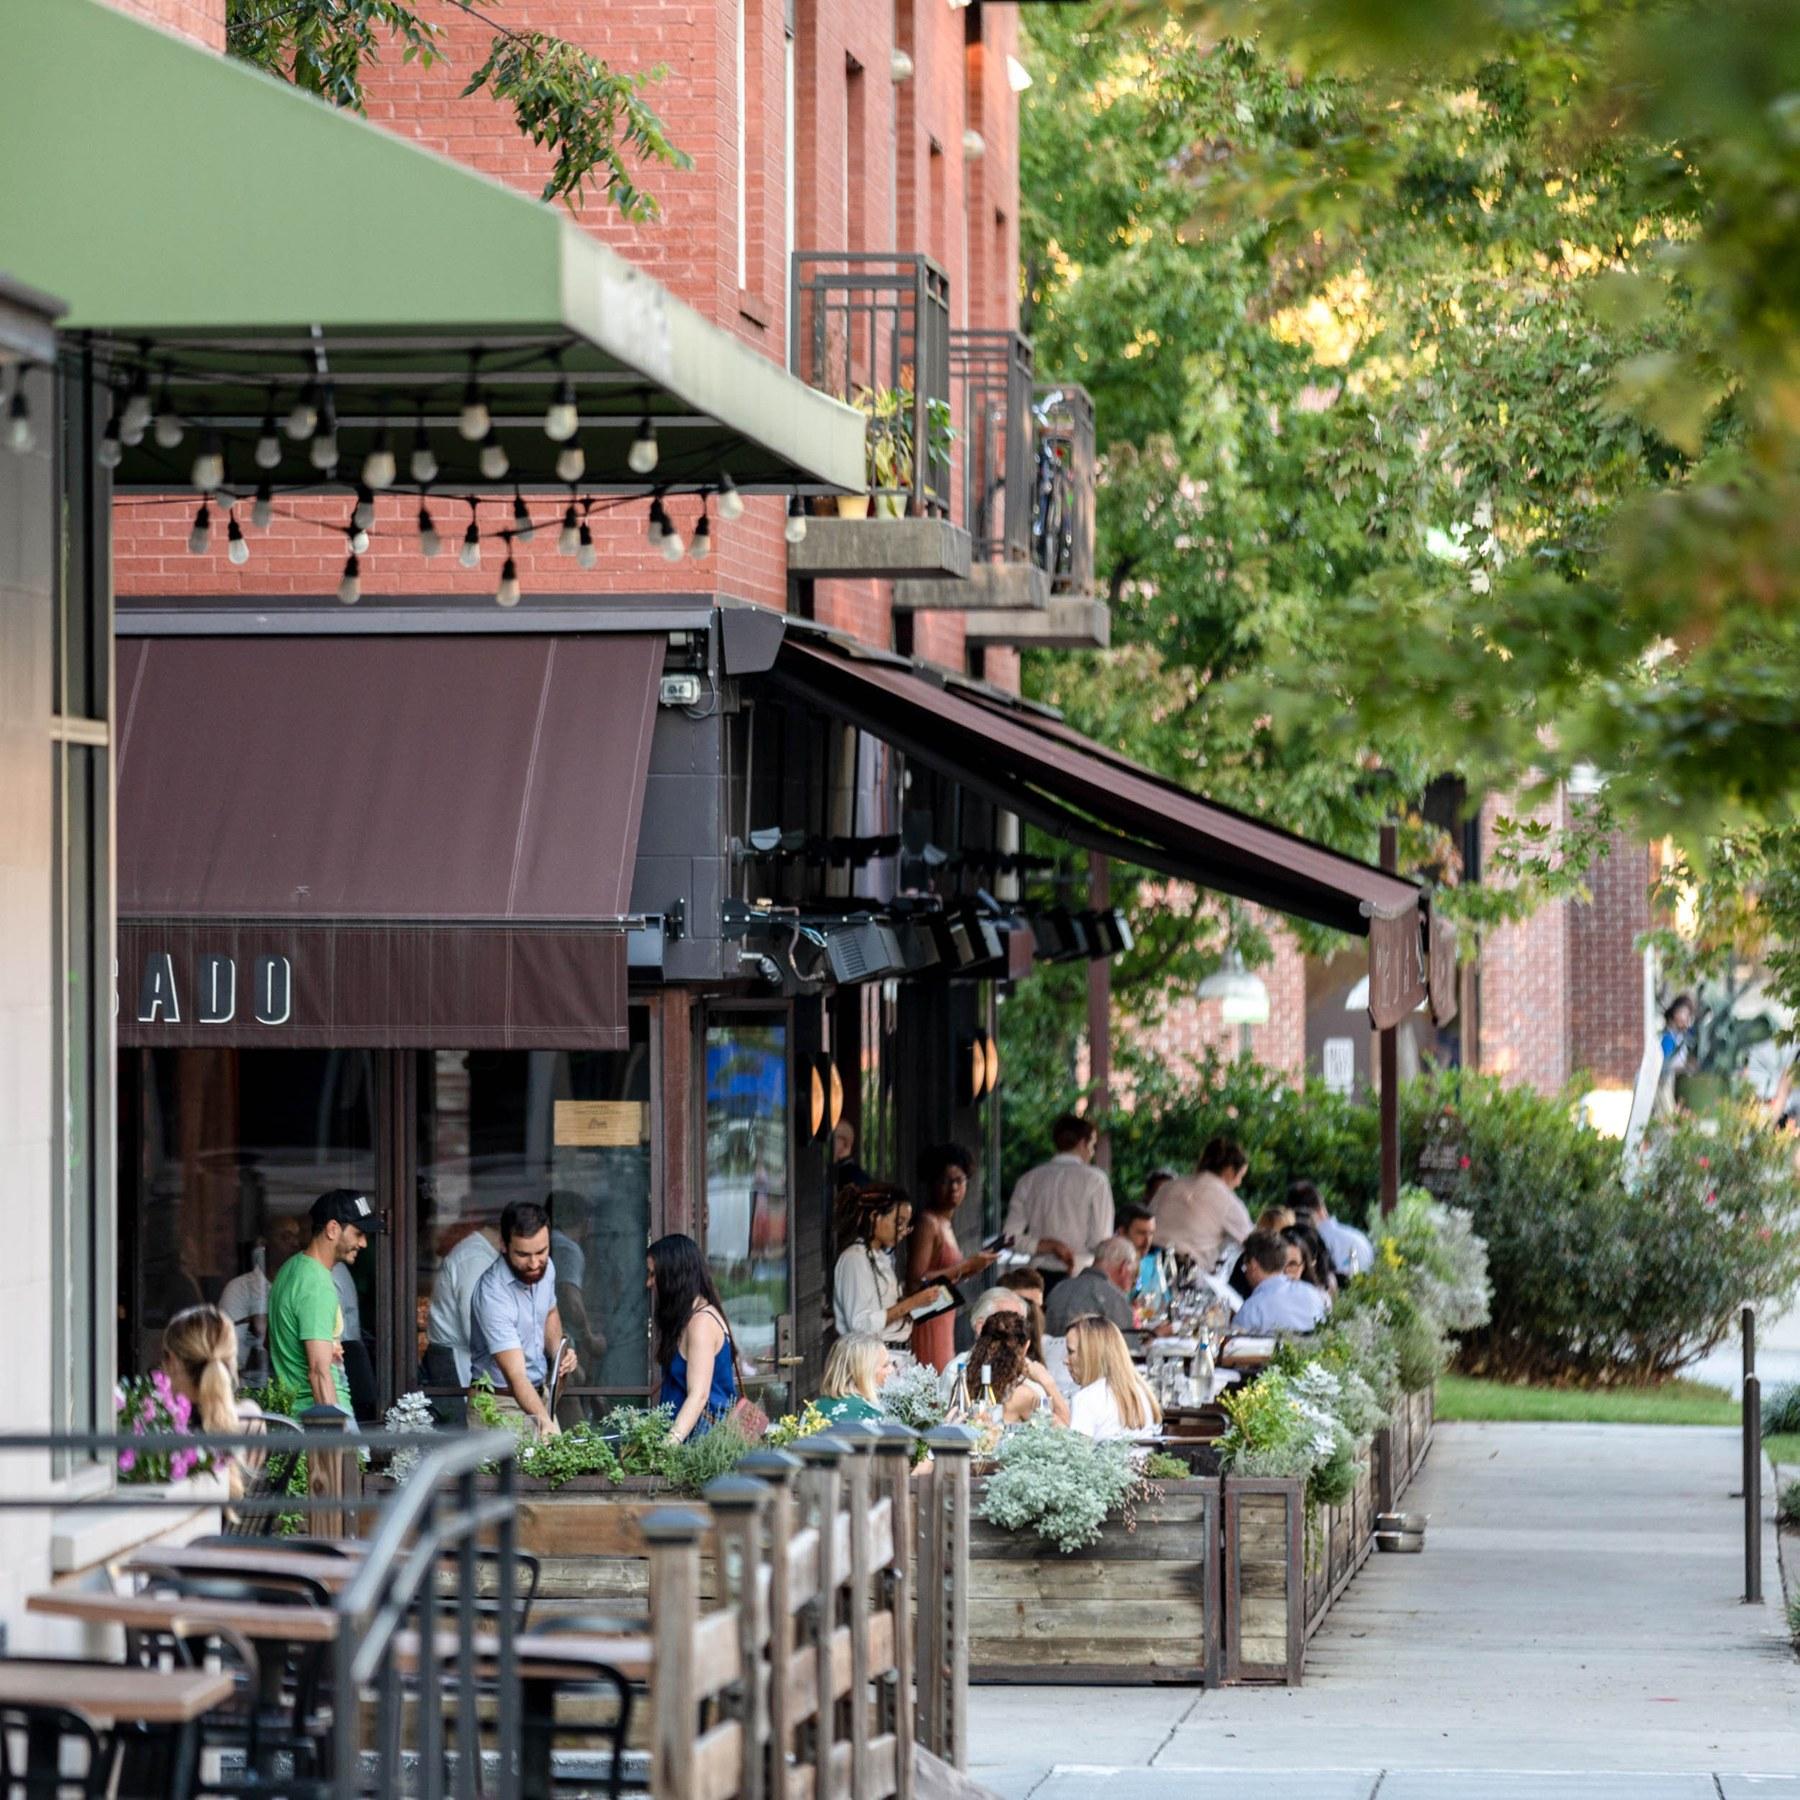 Local Com Homes For Rent: Inman Park, Atlanta GA - Neighborhood Guide